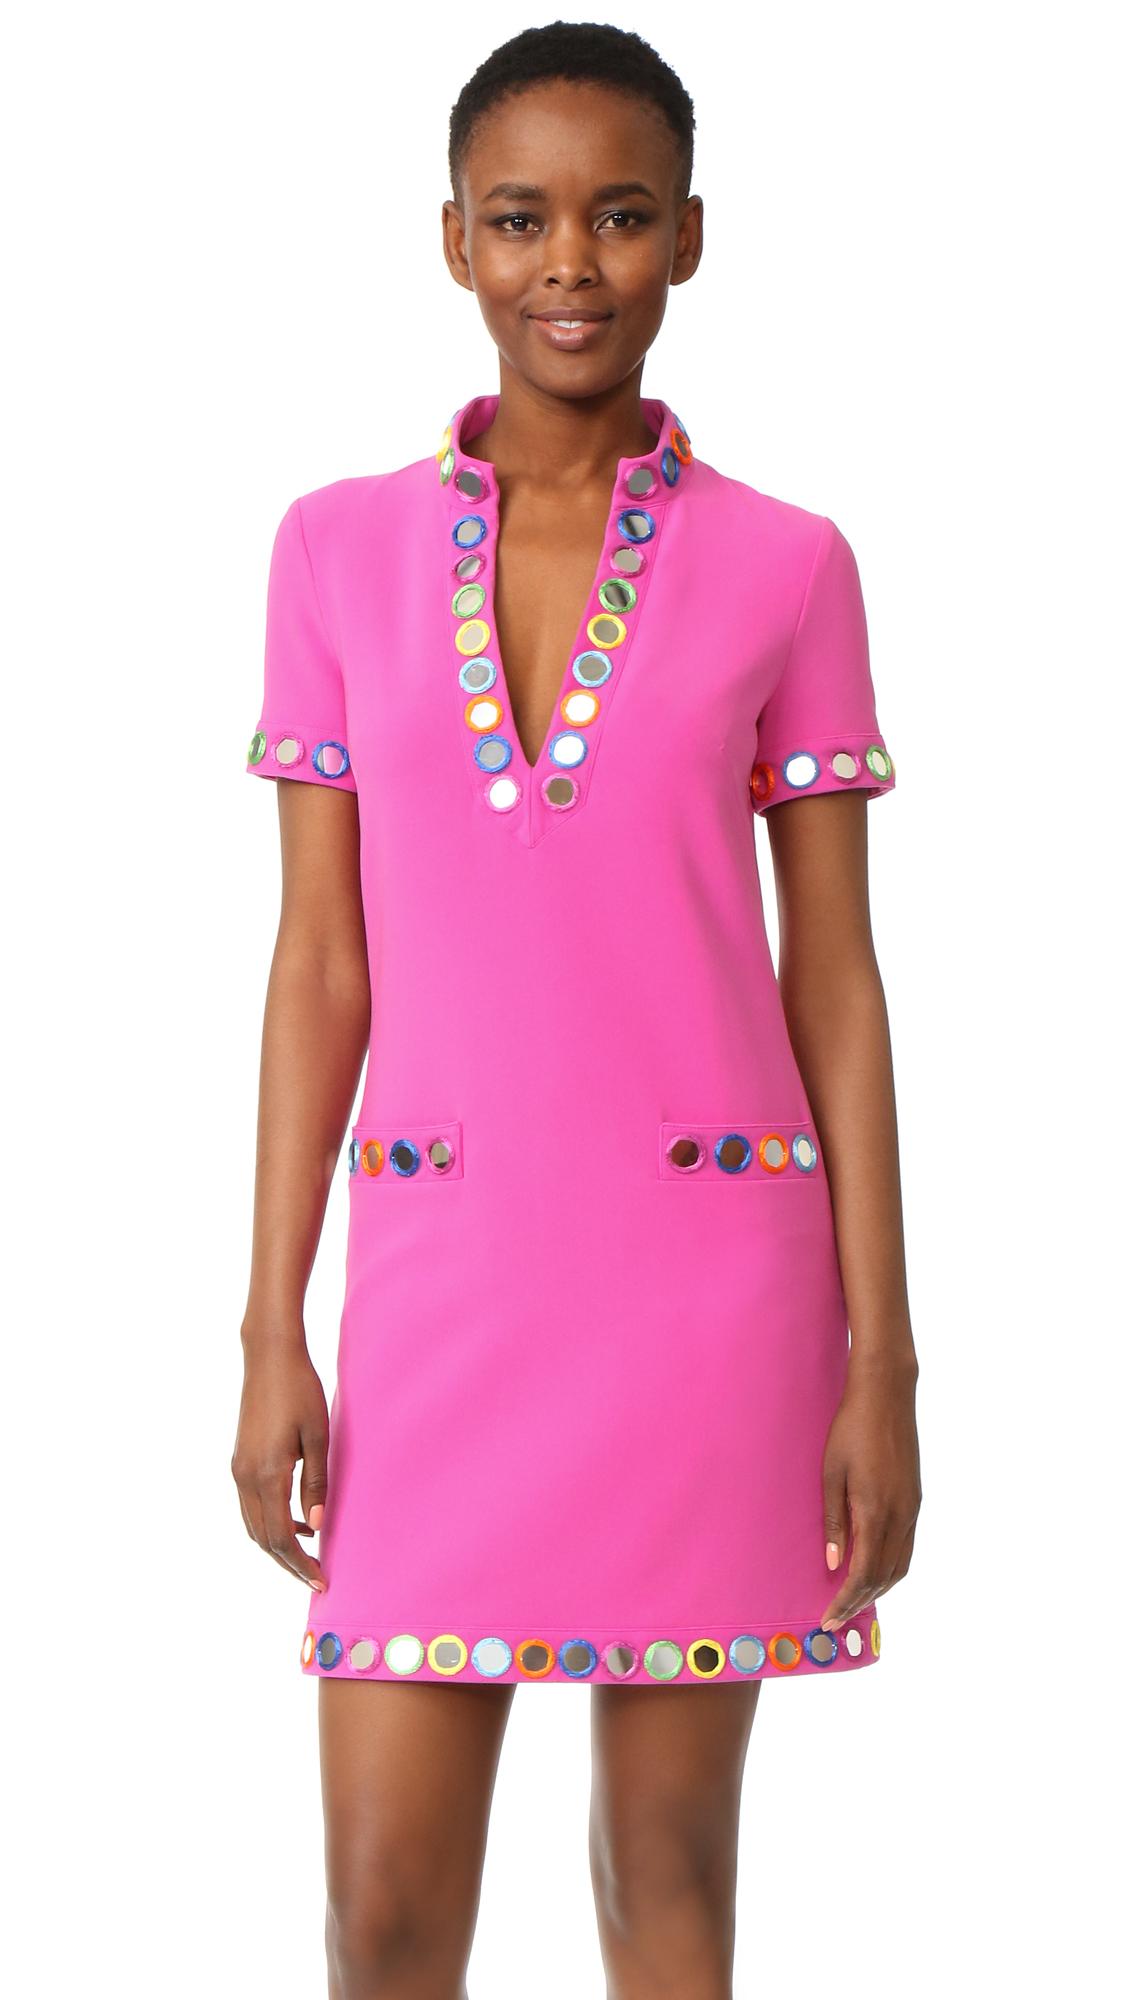 Moschino V Neck Dress - Fantasy Print Violet at Shopbop